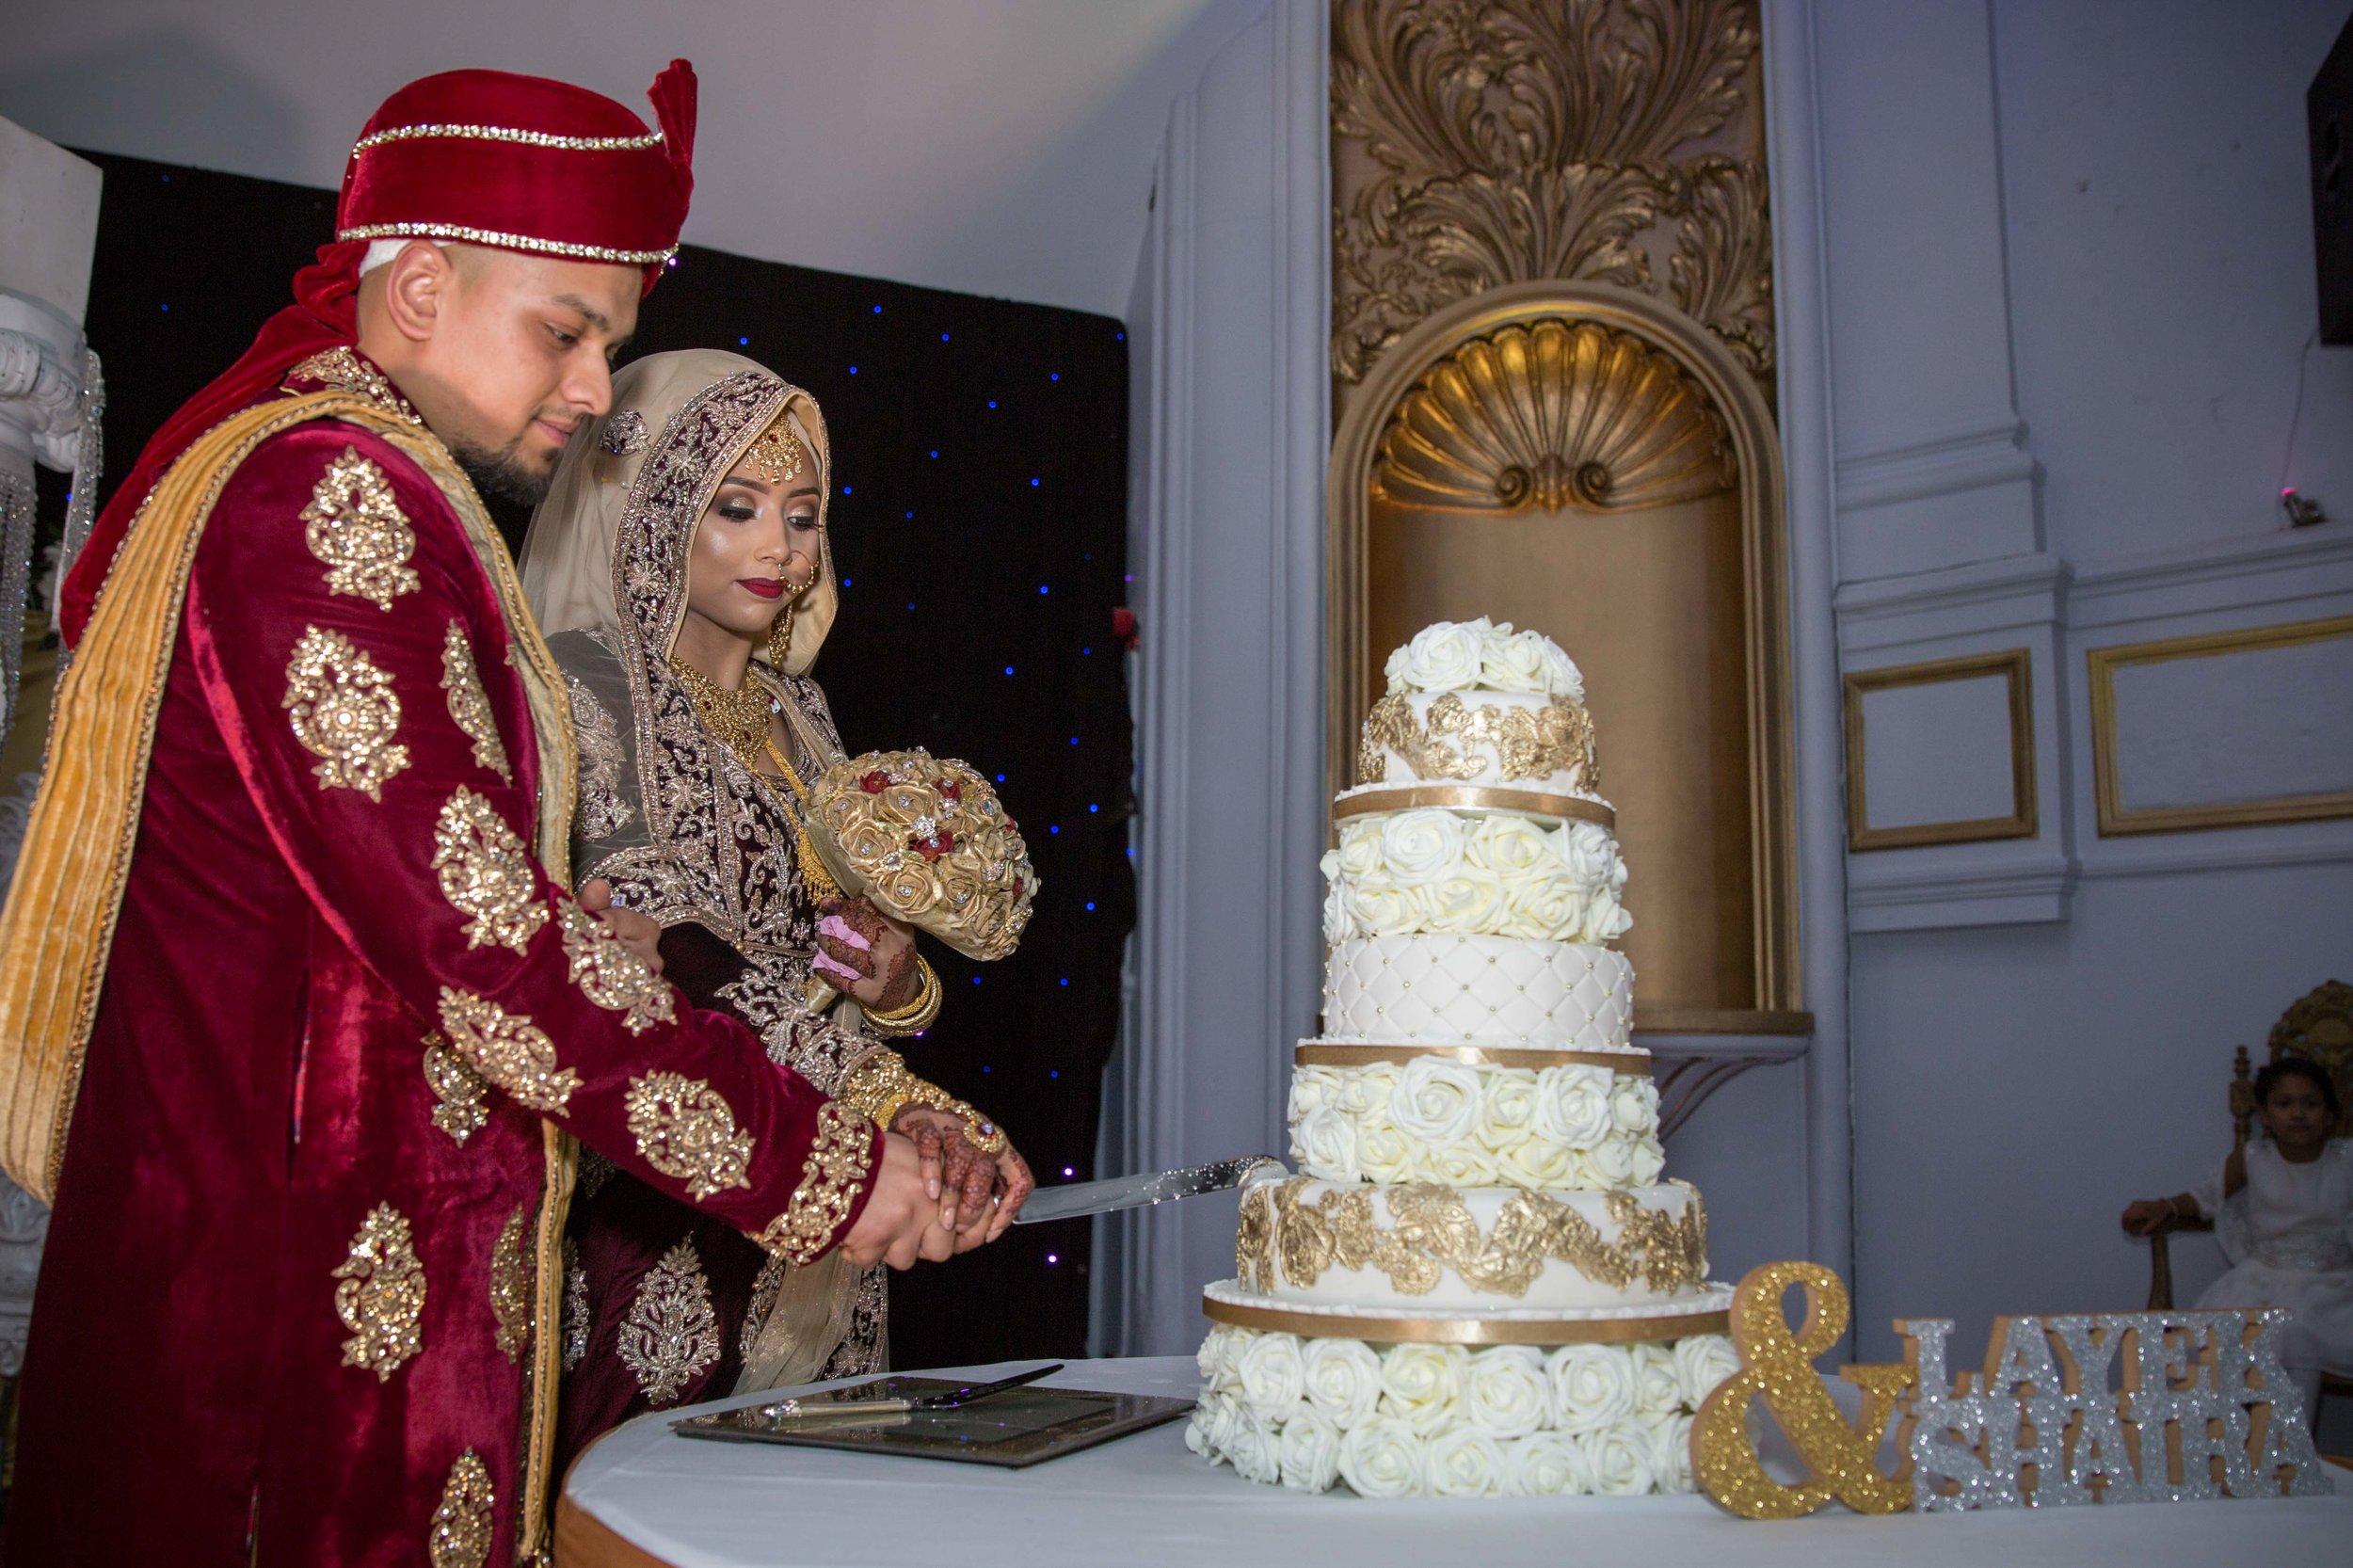 Female-Asian-Piccadilly-banqueting-suite-Wedding-Photographer-Birmingham-natalia-smith-photography-26.jpg